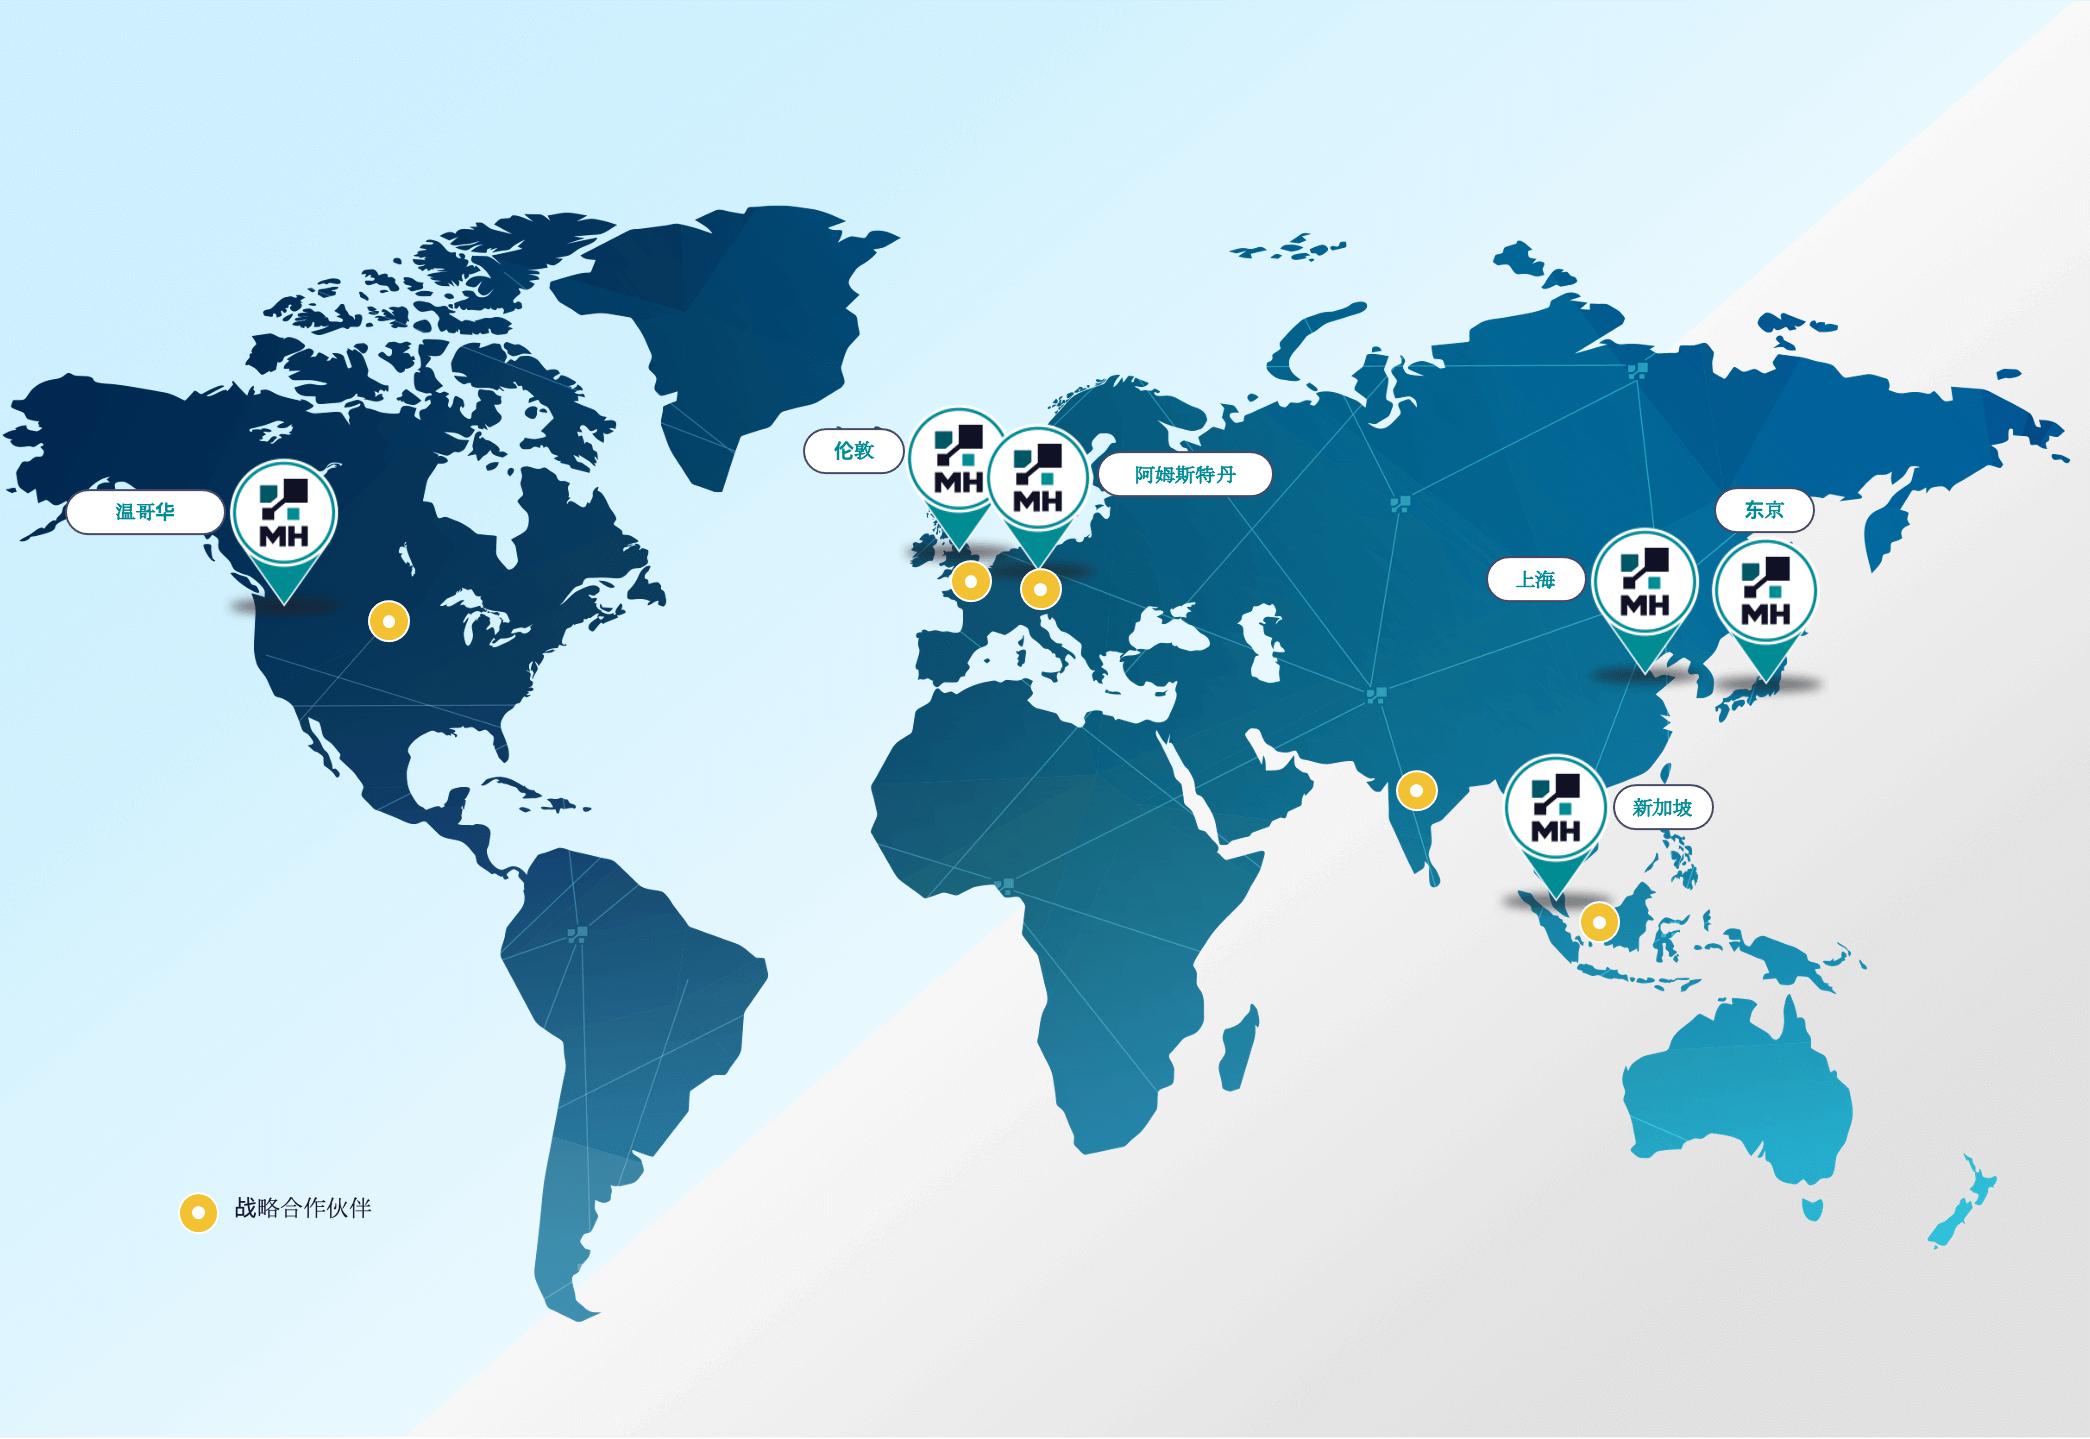 World map of MineHub offices